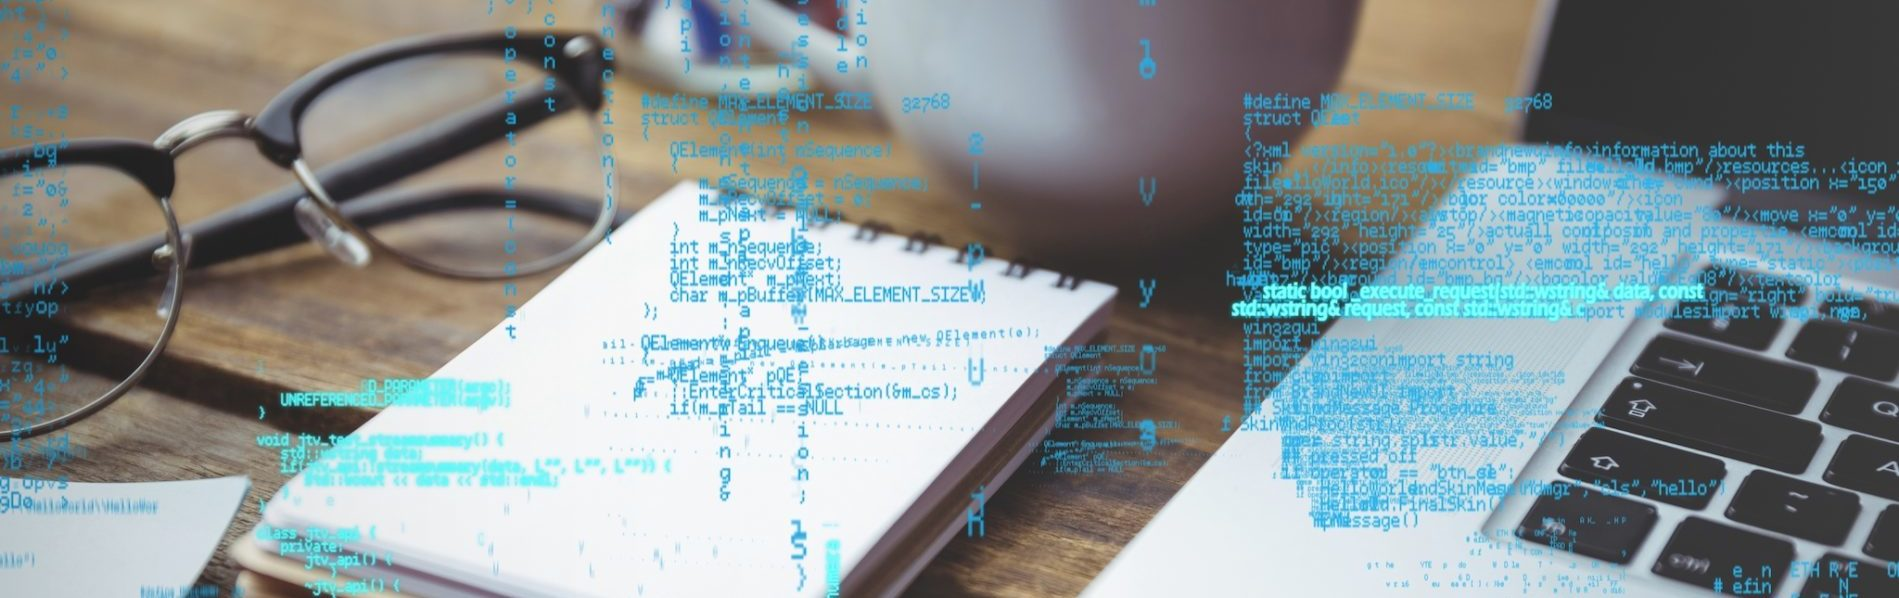 Web Studio ビズラボ